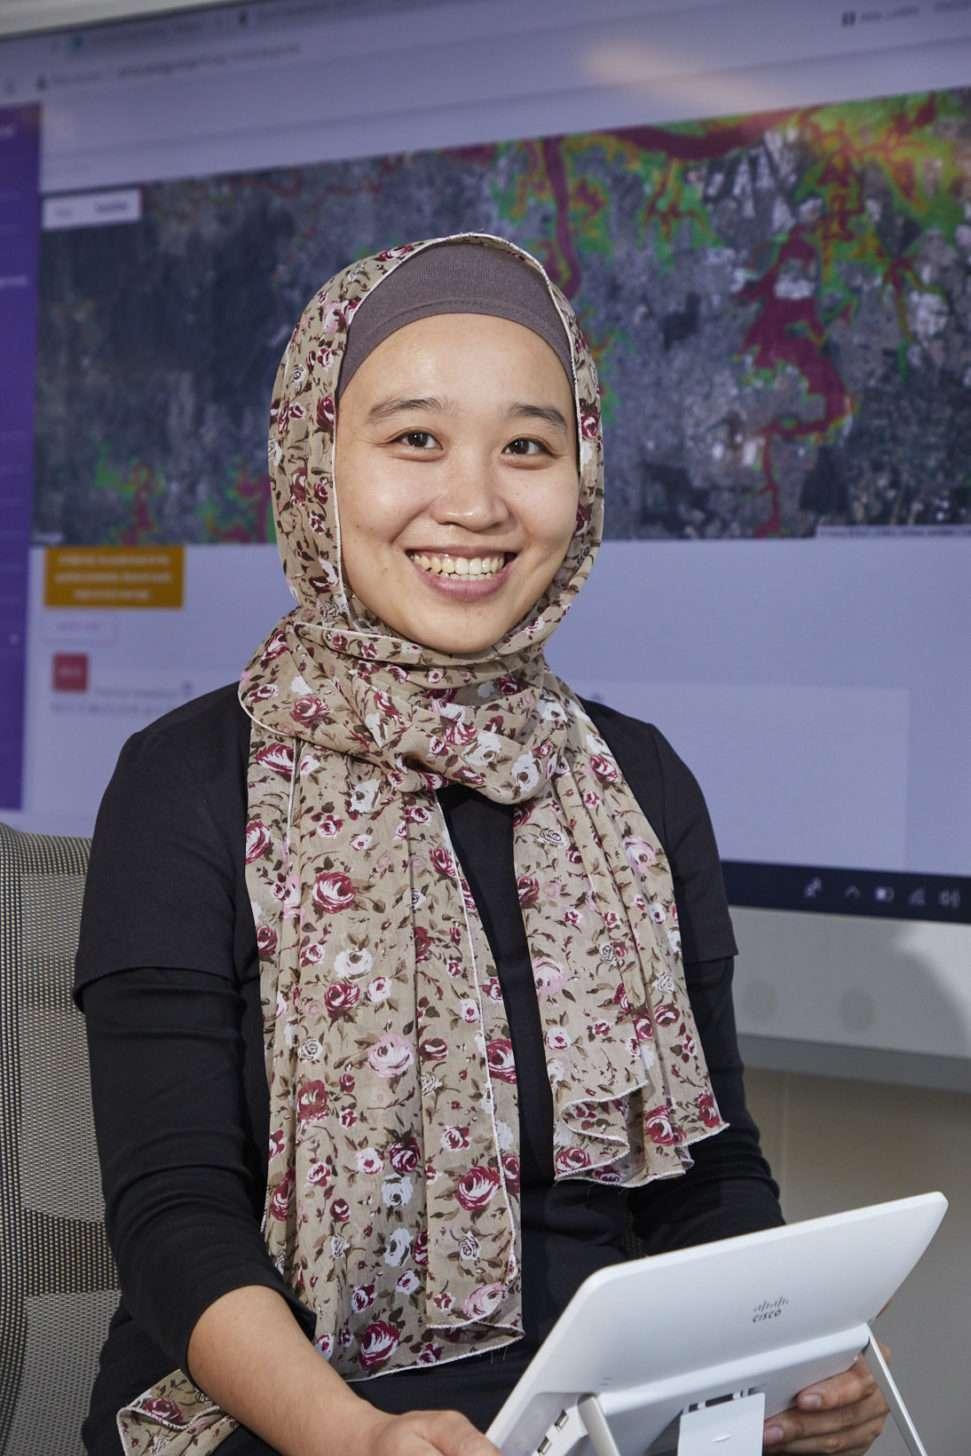 Xueying (Sylvia) Wang